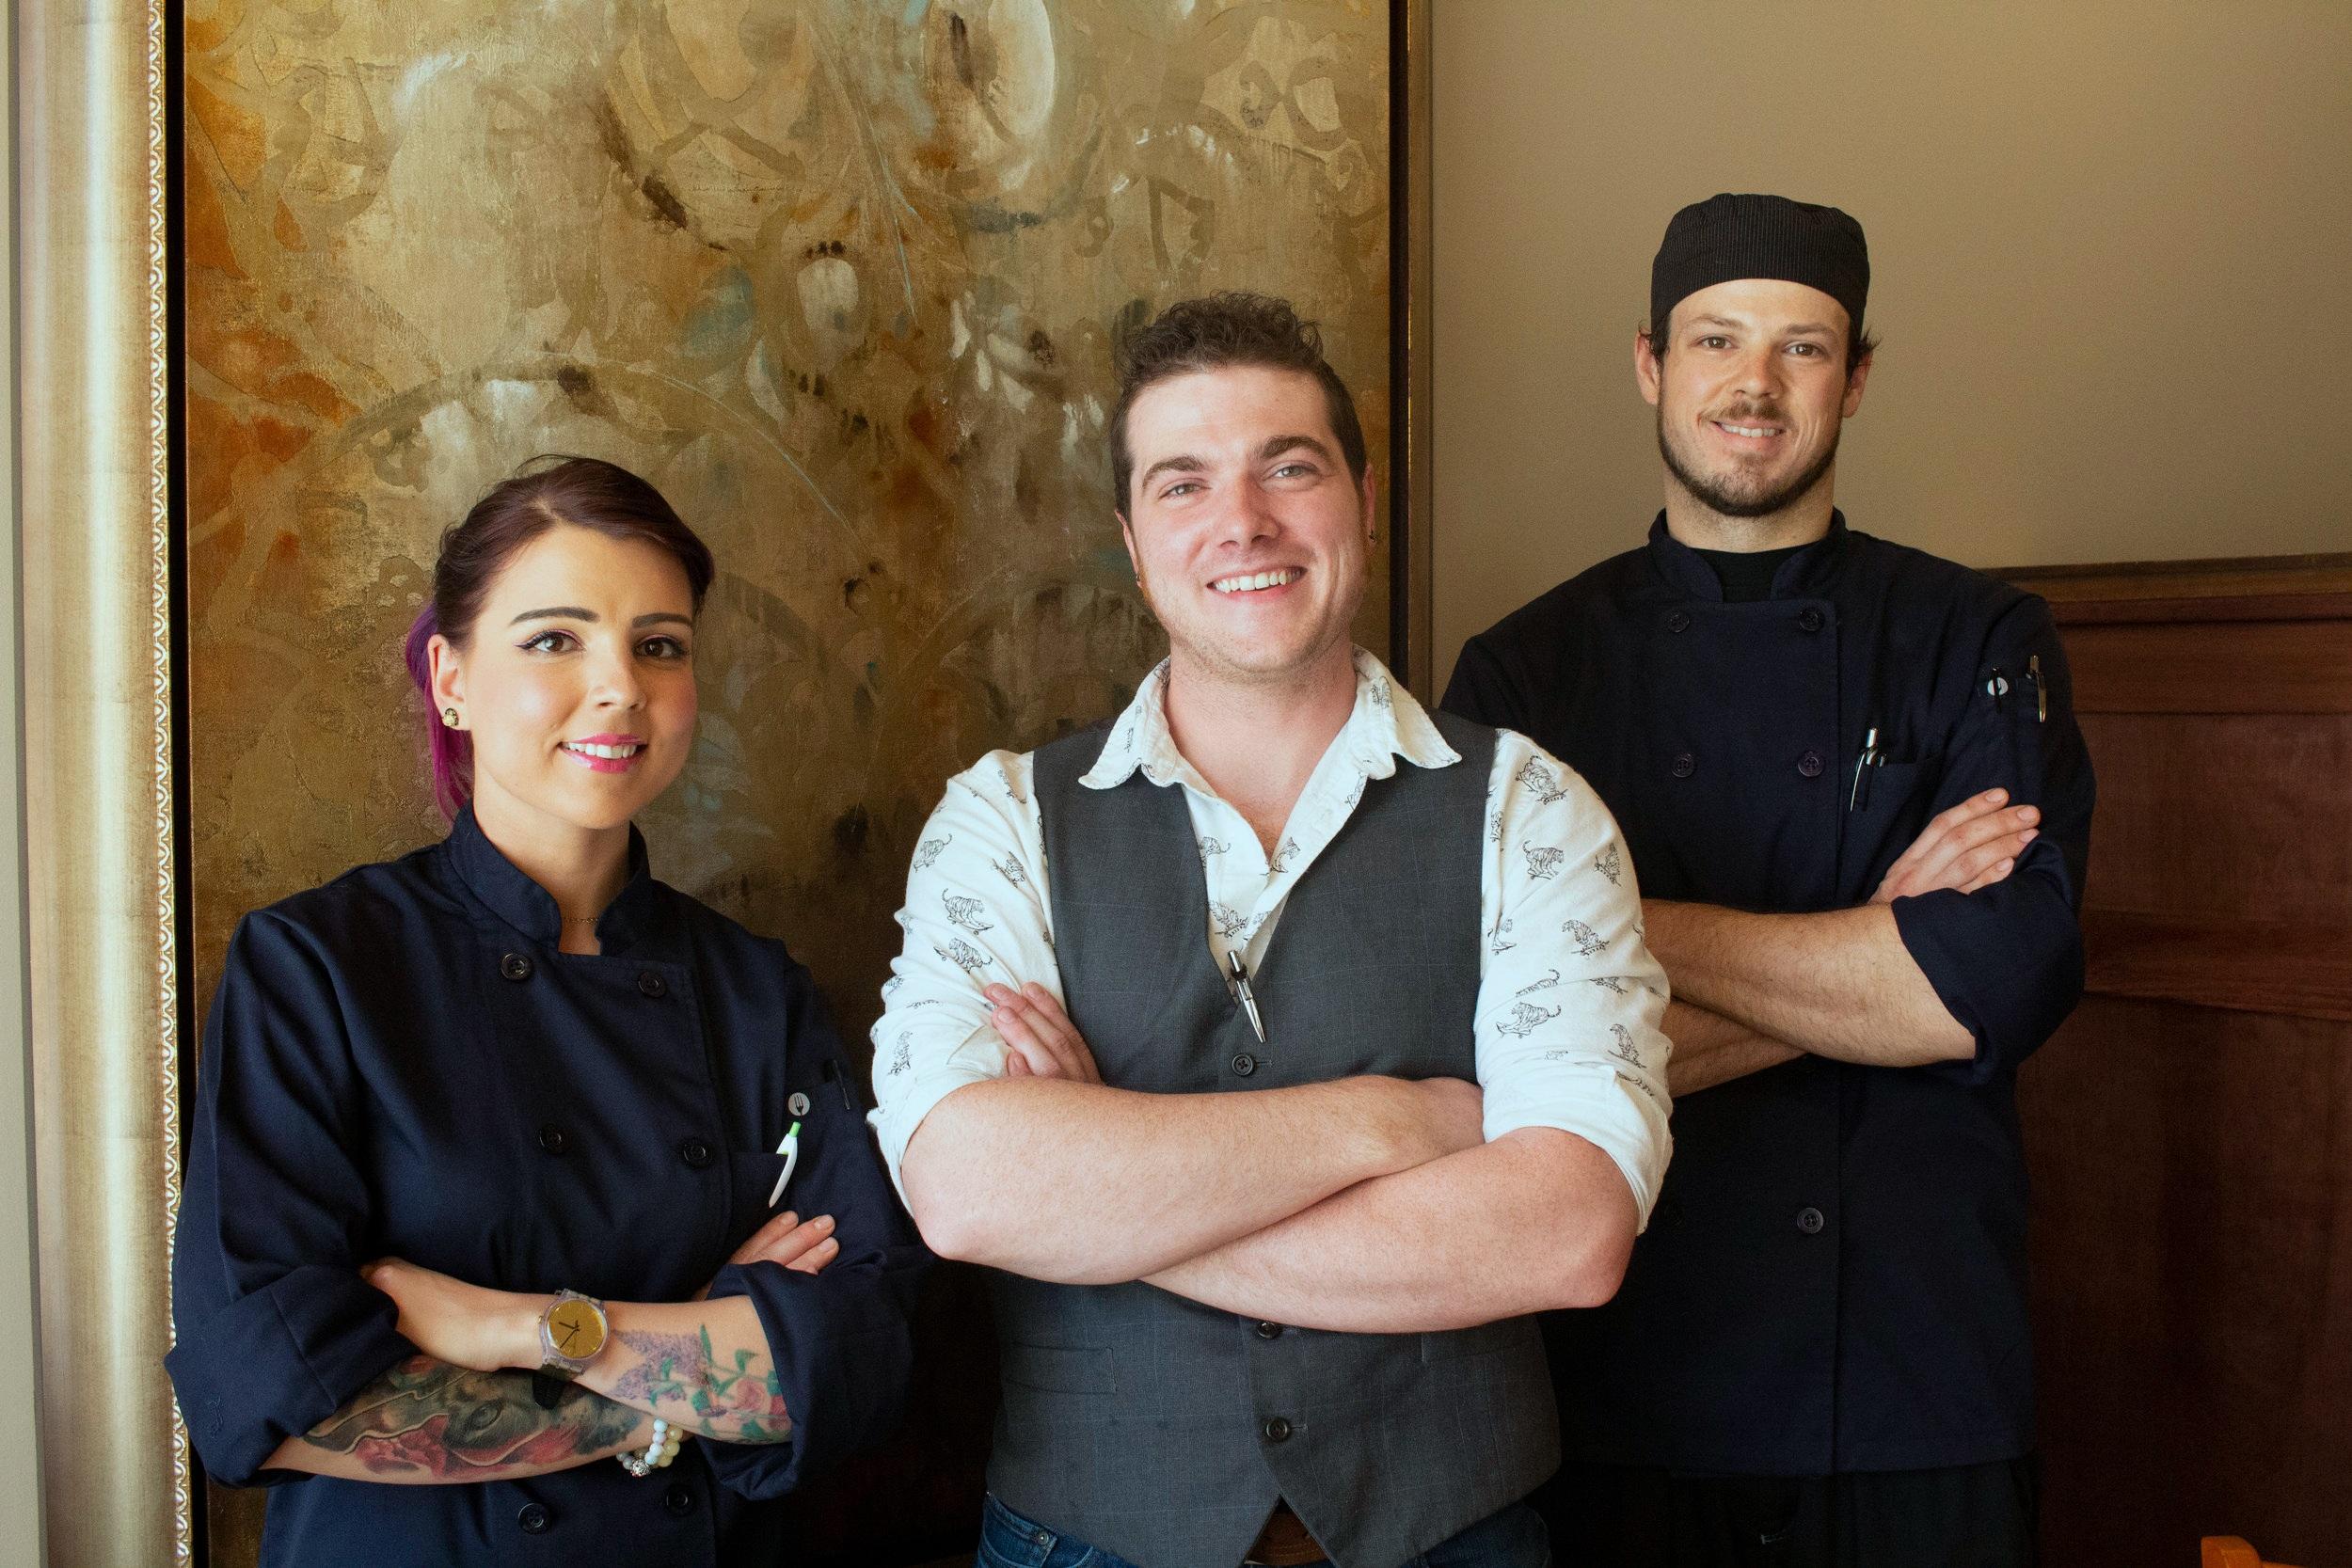 Meet the Team - Joel Kane, General ManagerAnthony Valvoda, Executive Partner ChefCamilla Starr, Executive Partner Chef